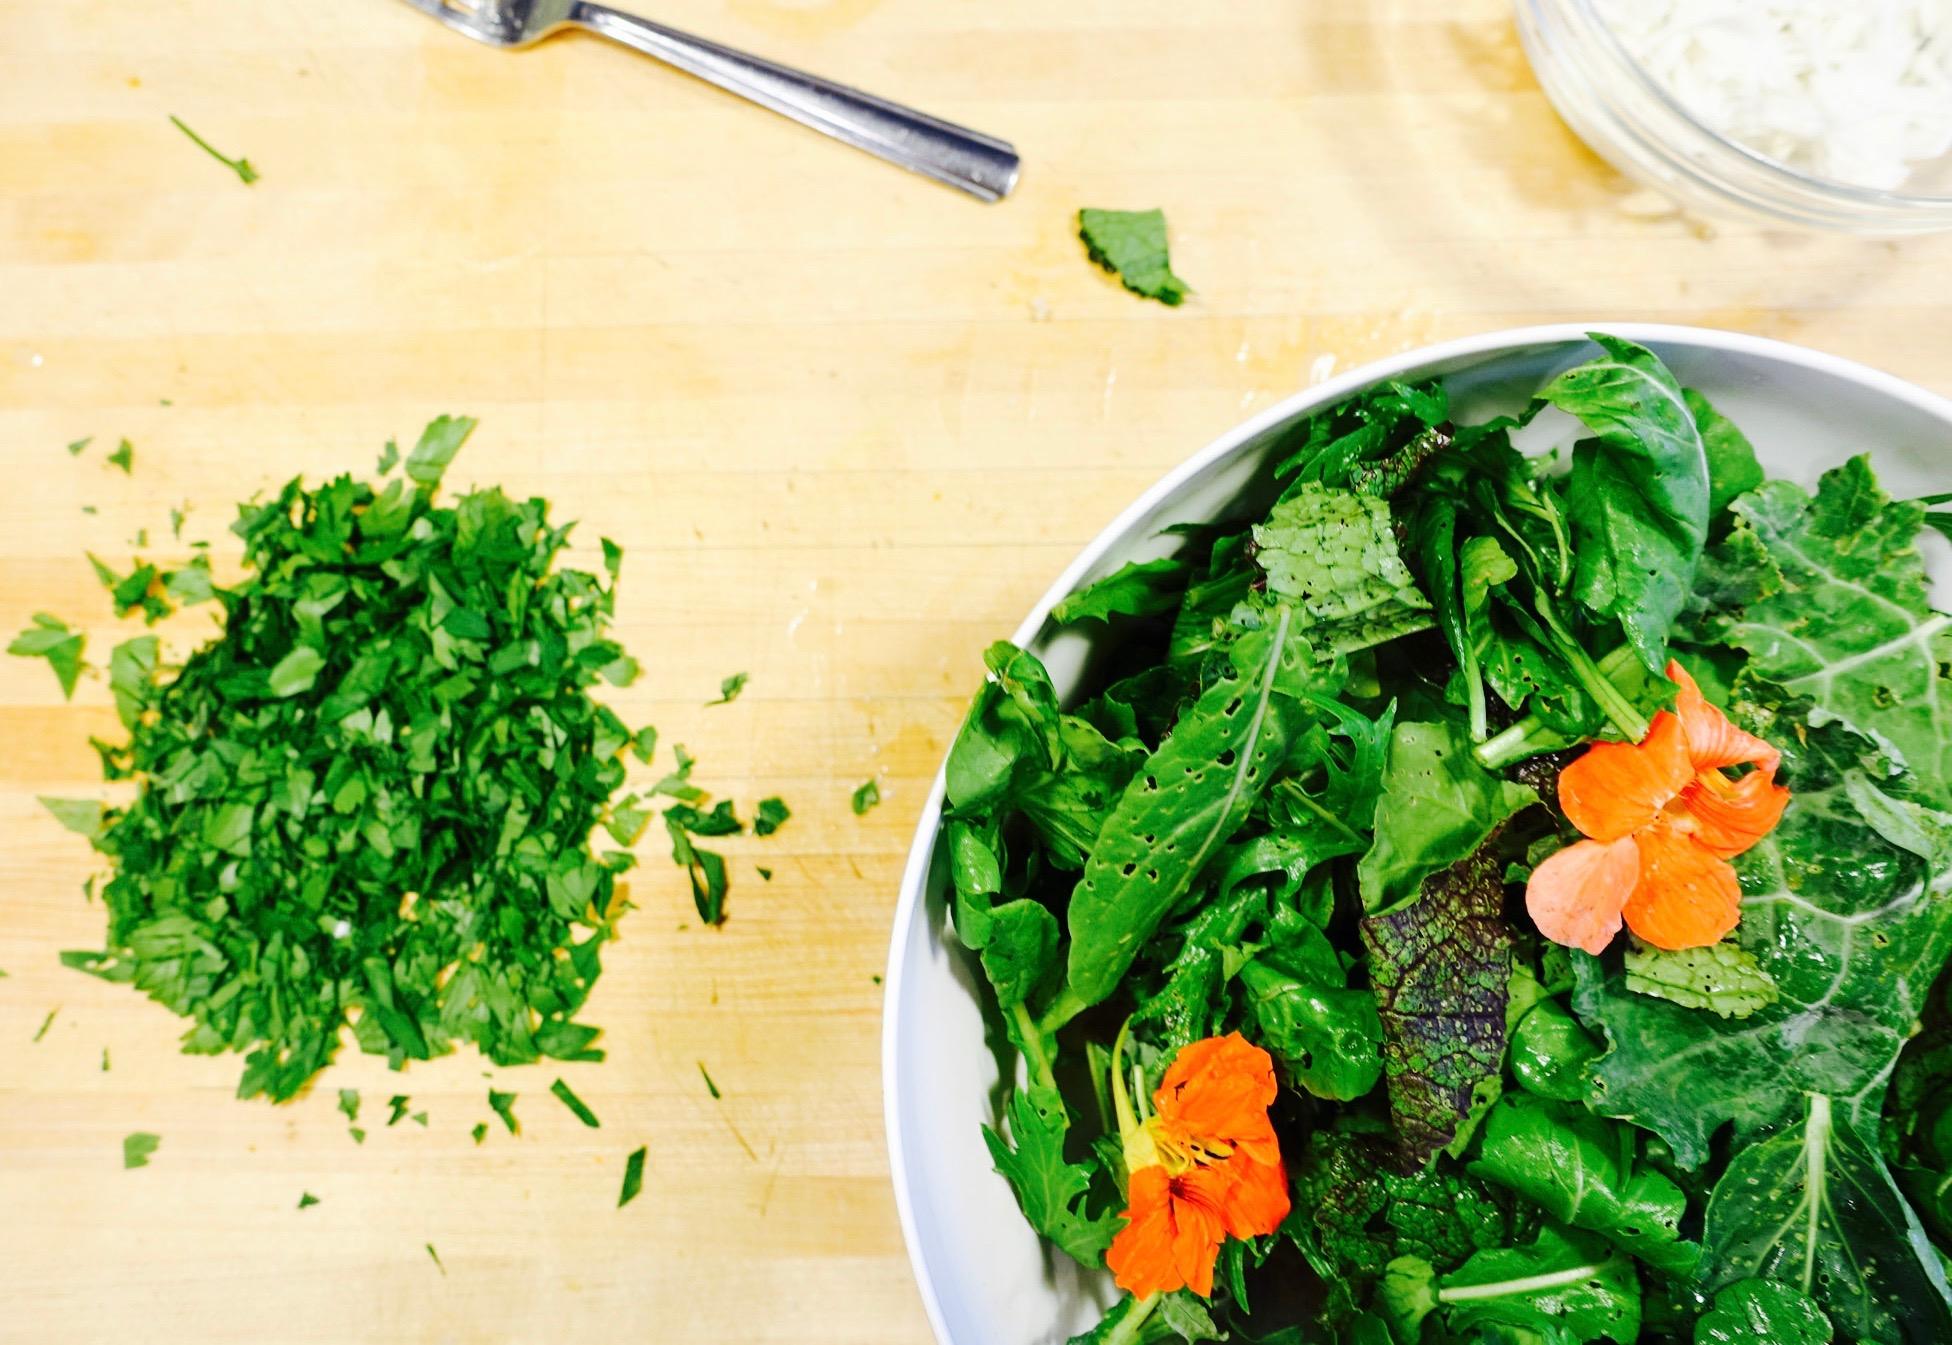 salad and herbs